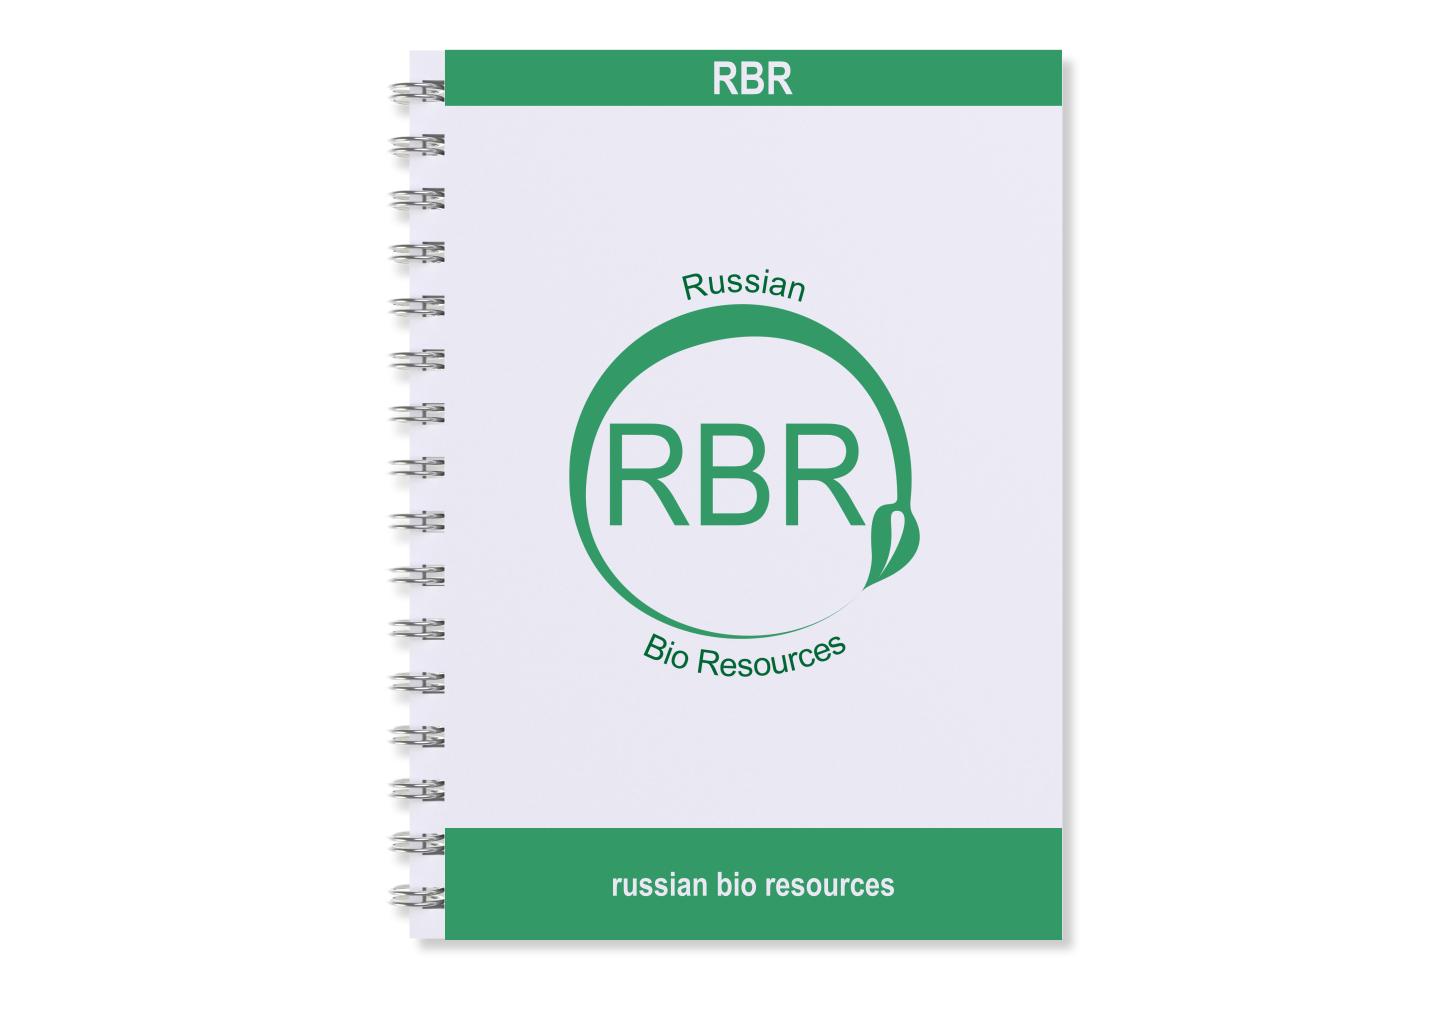 Разработка логотипа для компании «Русские Био Ресурсы» фото f_1175904ed637c455.png